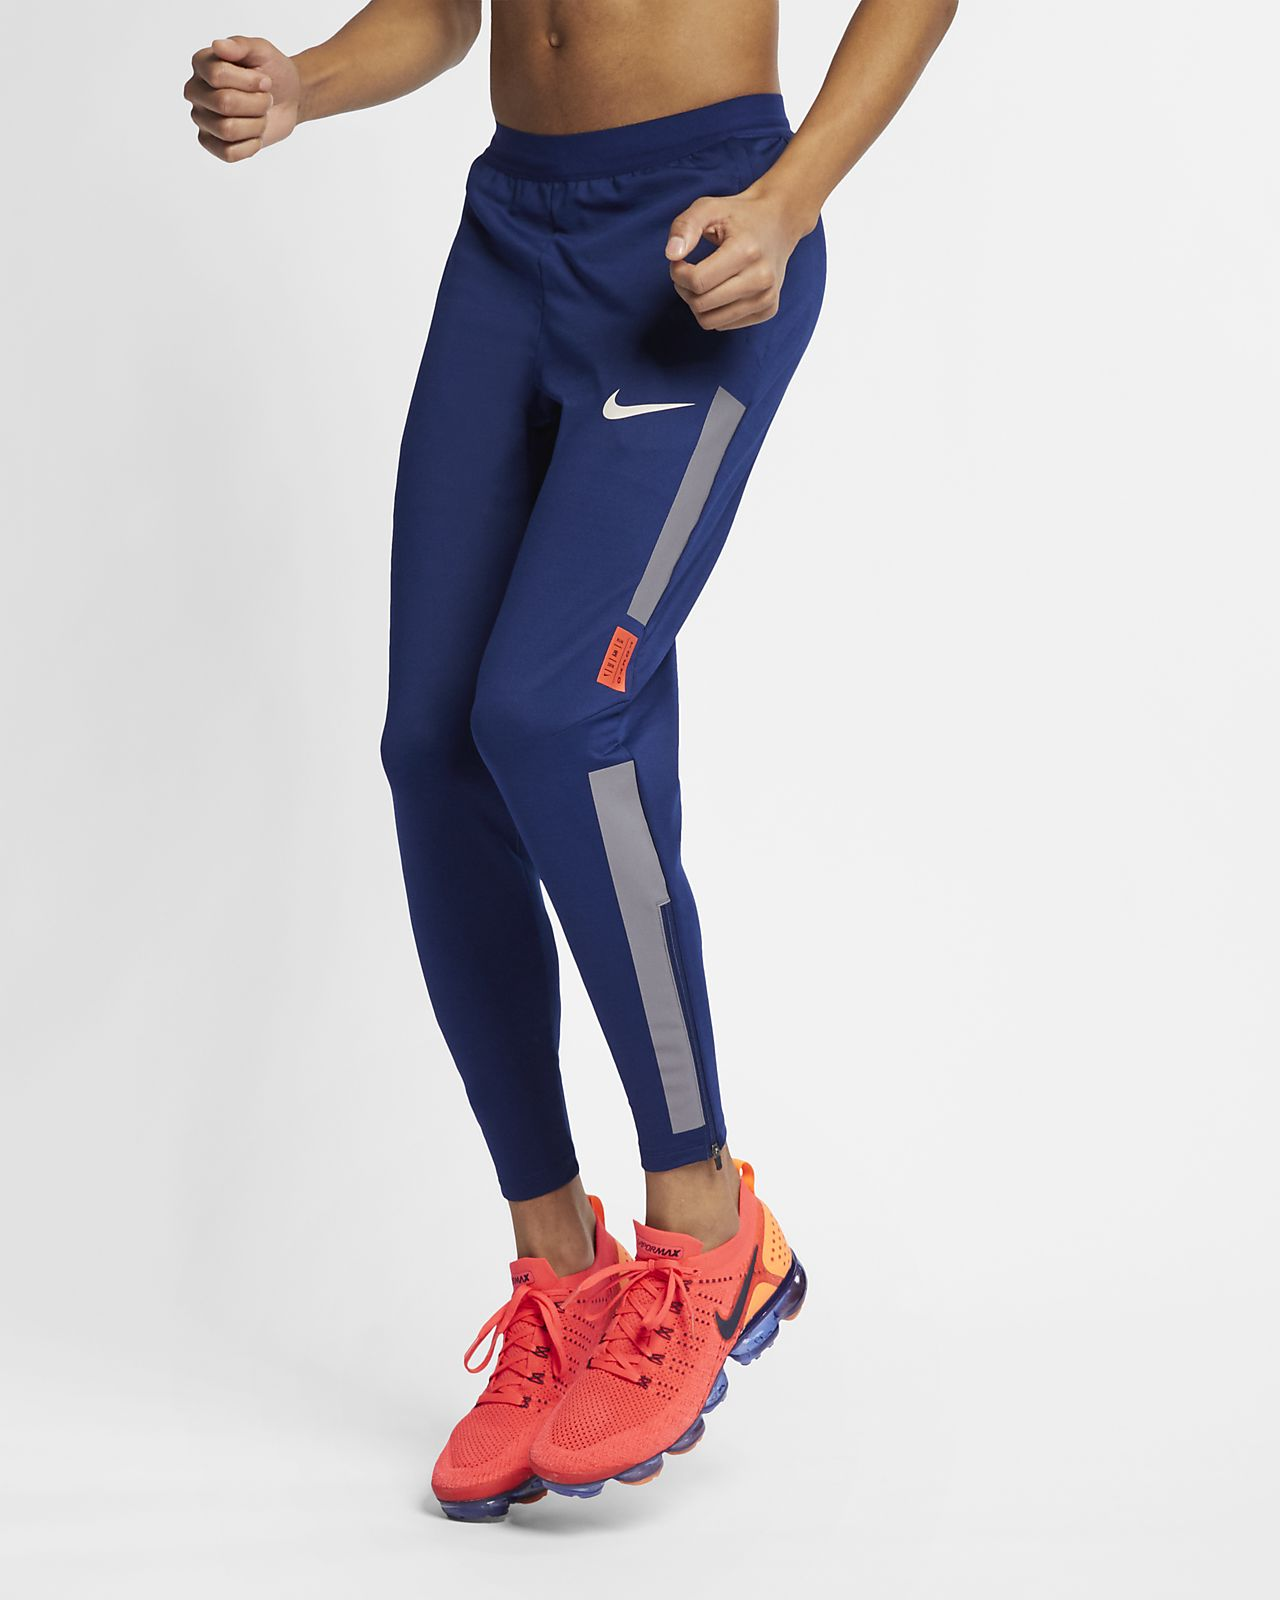 8037755cf1aa Nike Phenom Men s Running Trousers. Nike.com AU